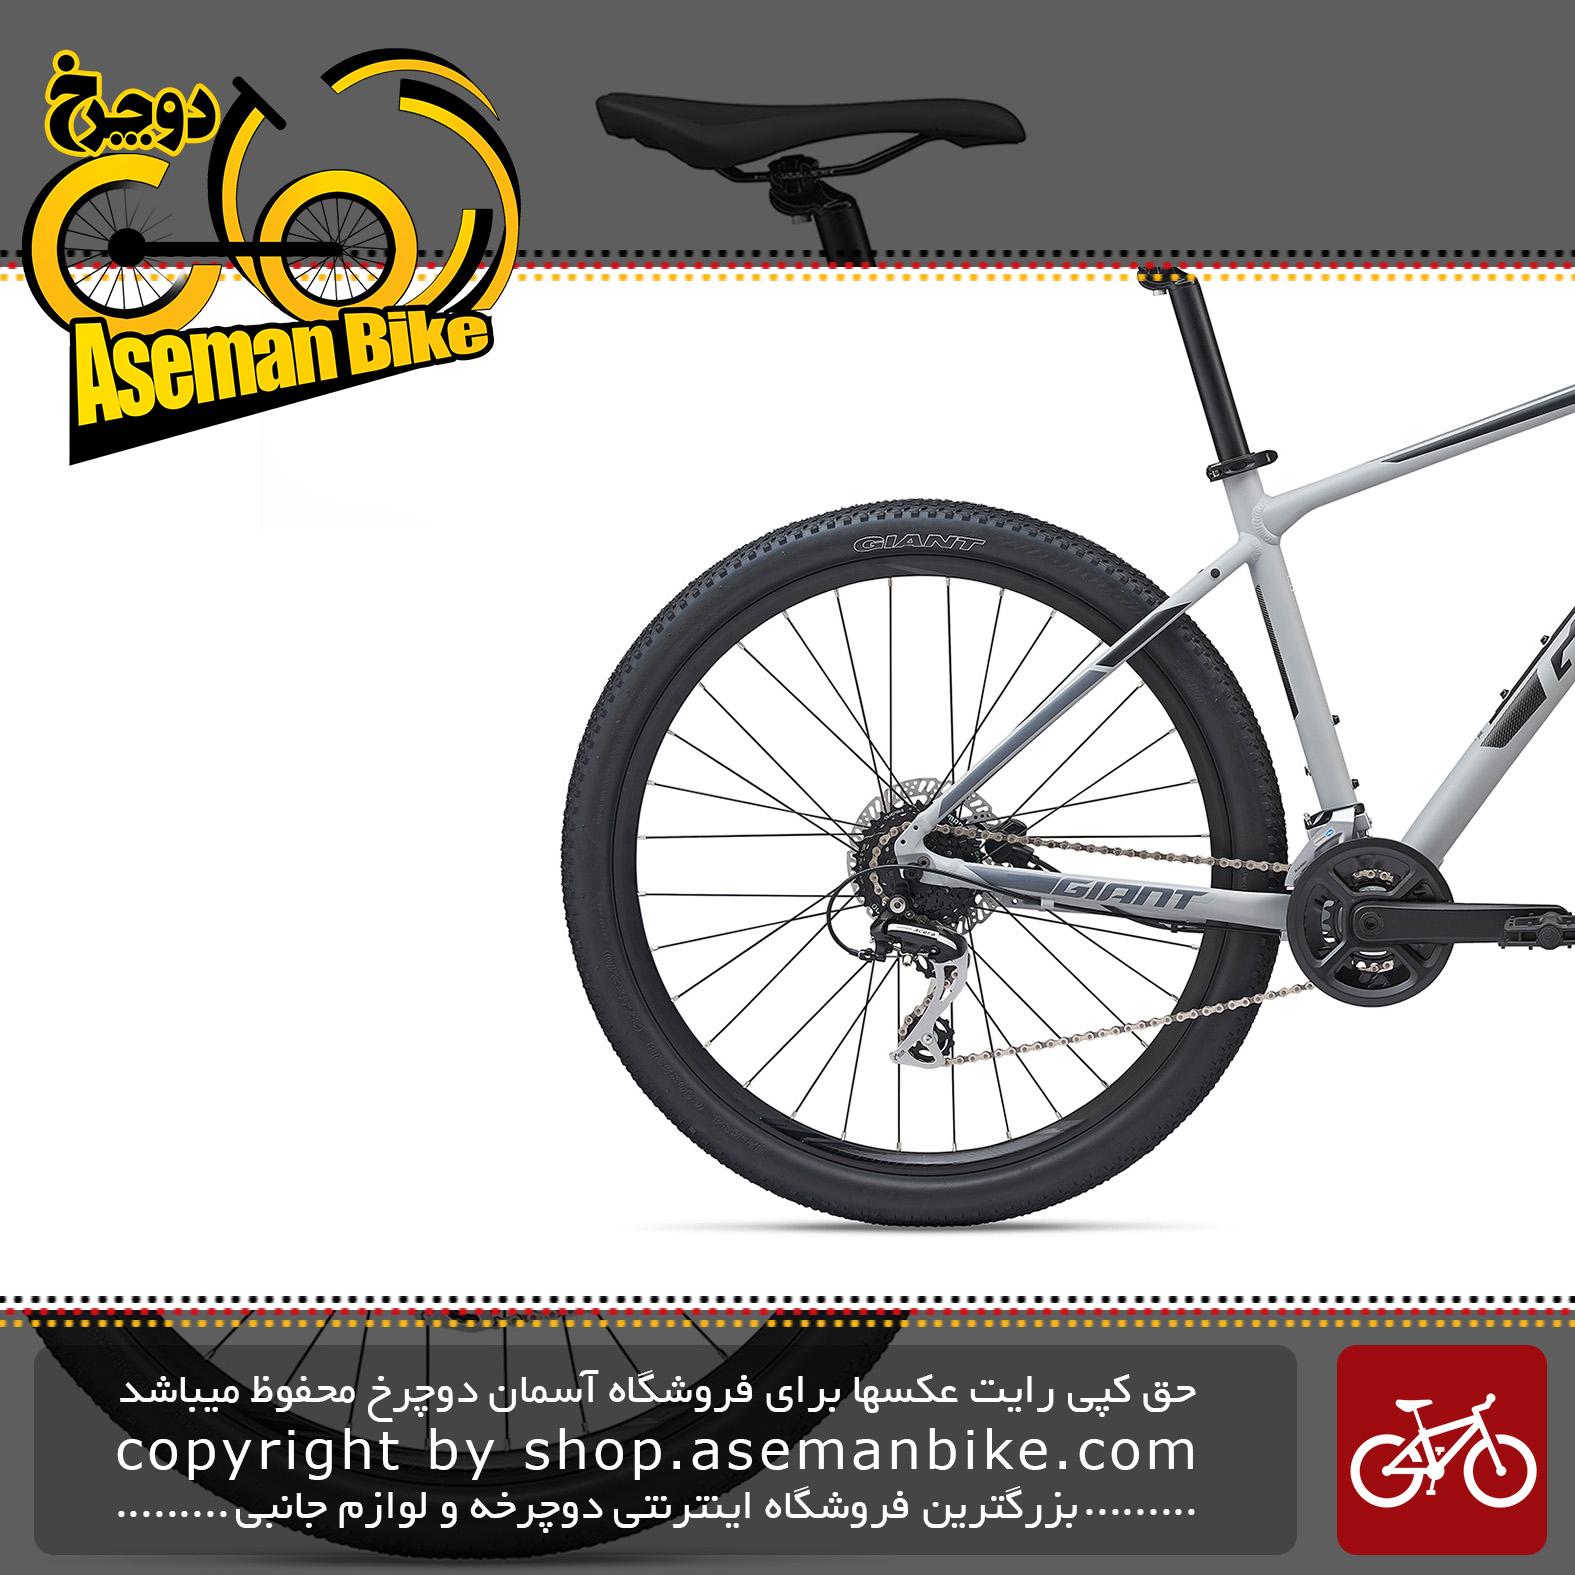 دوچرخه کوهستان جاینت مدل ای تی ایکس 1 2020 Giant Mountain Bicycle ATX 1 2020